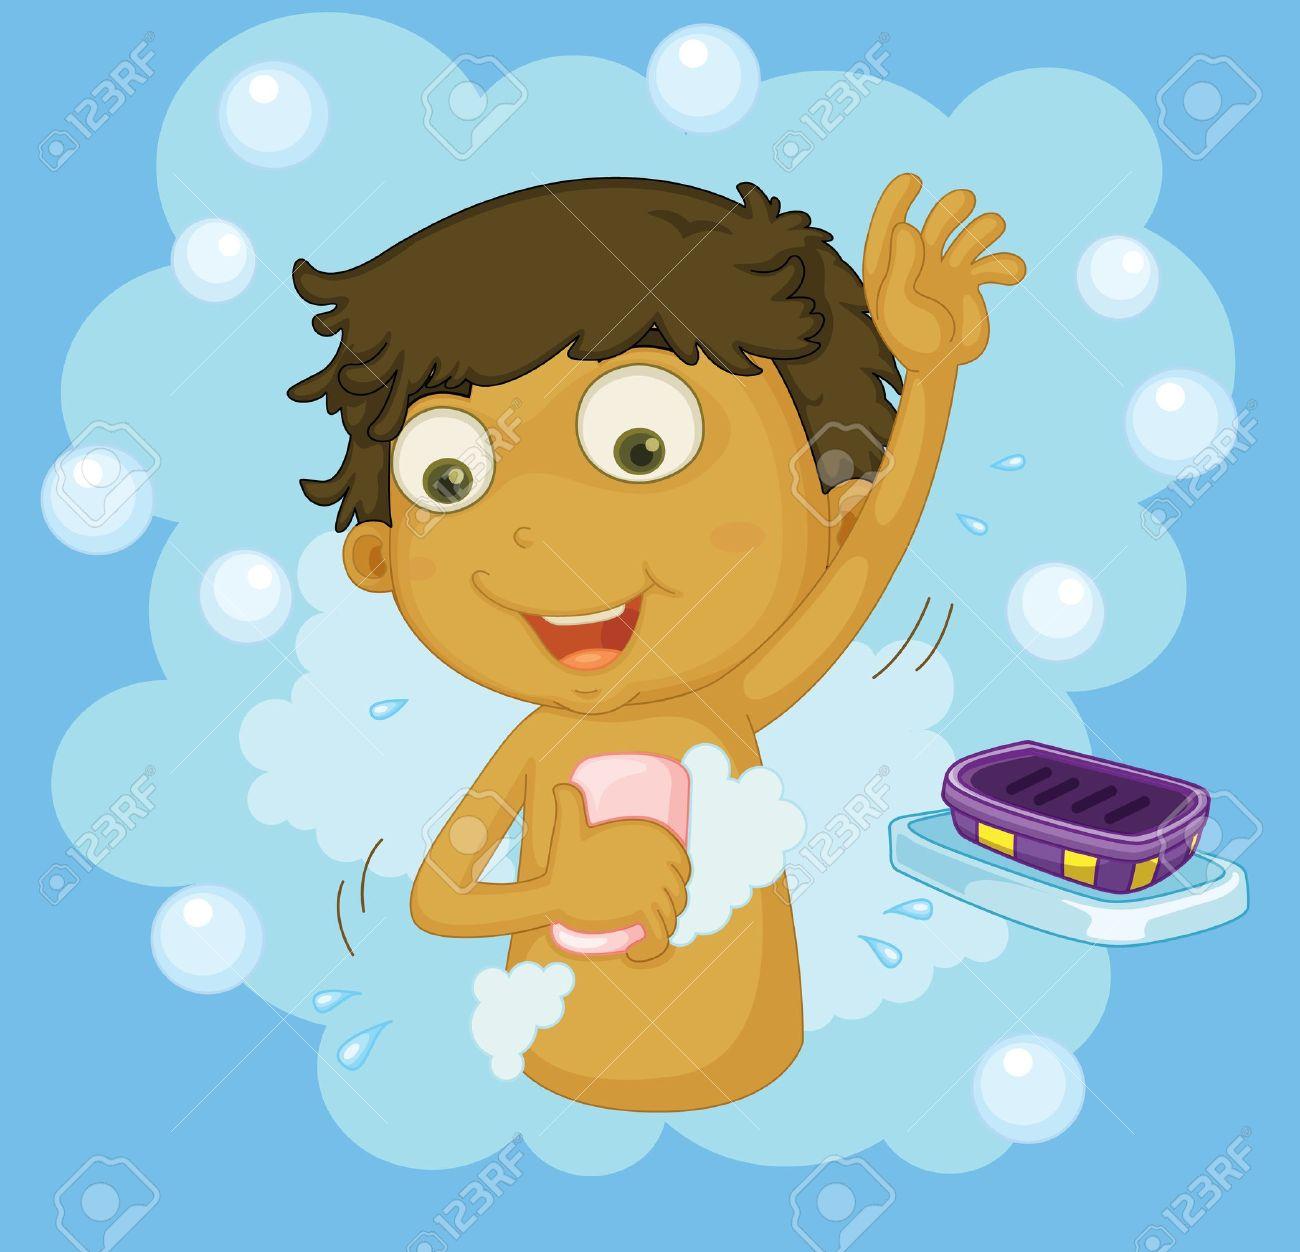 Illustration of a boy showering.